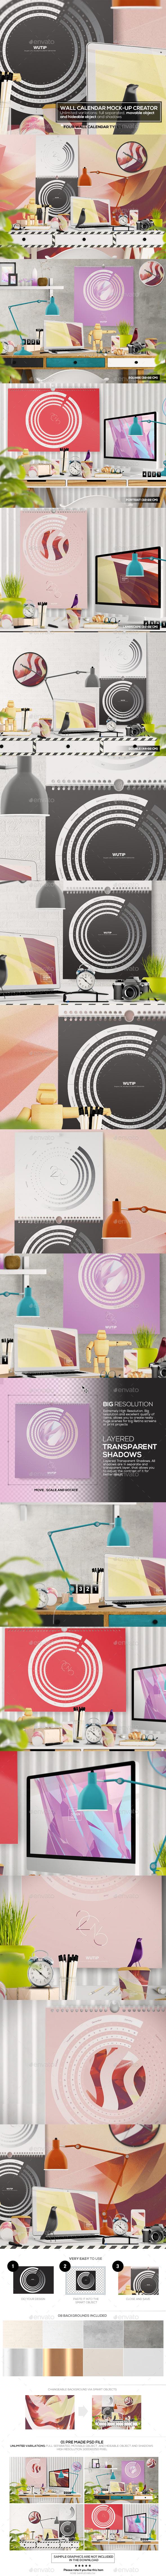 Wall Calendar Mockup Creator - Miscellaneous Print